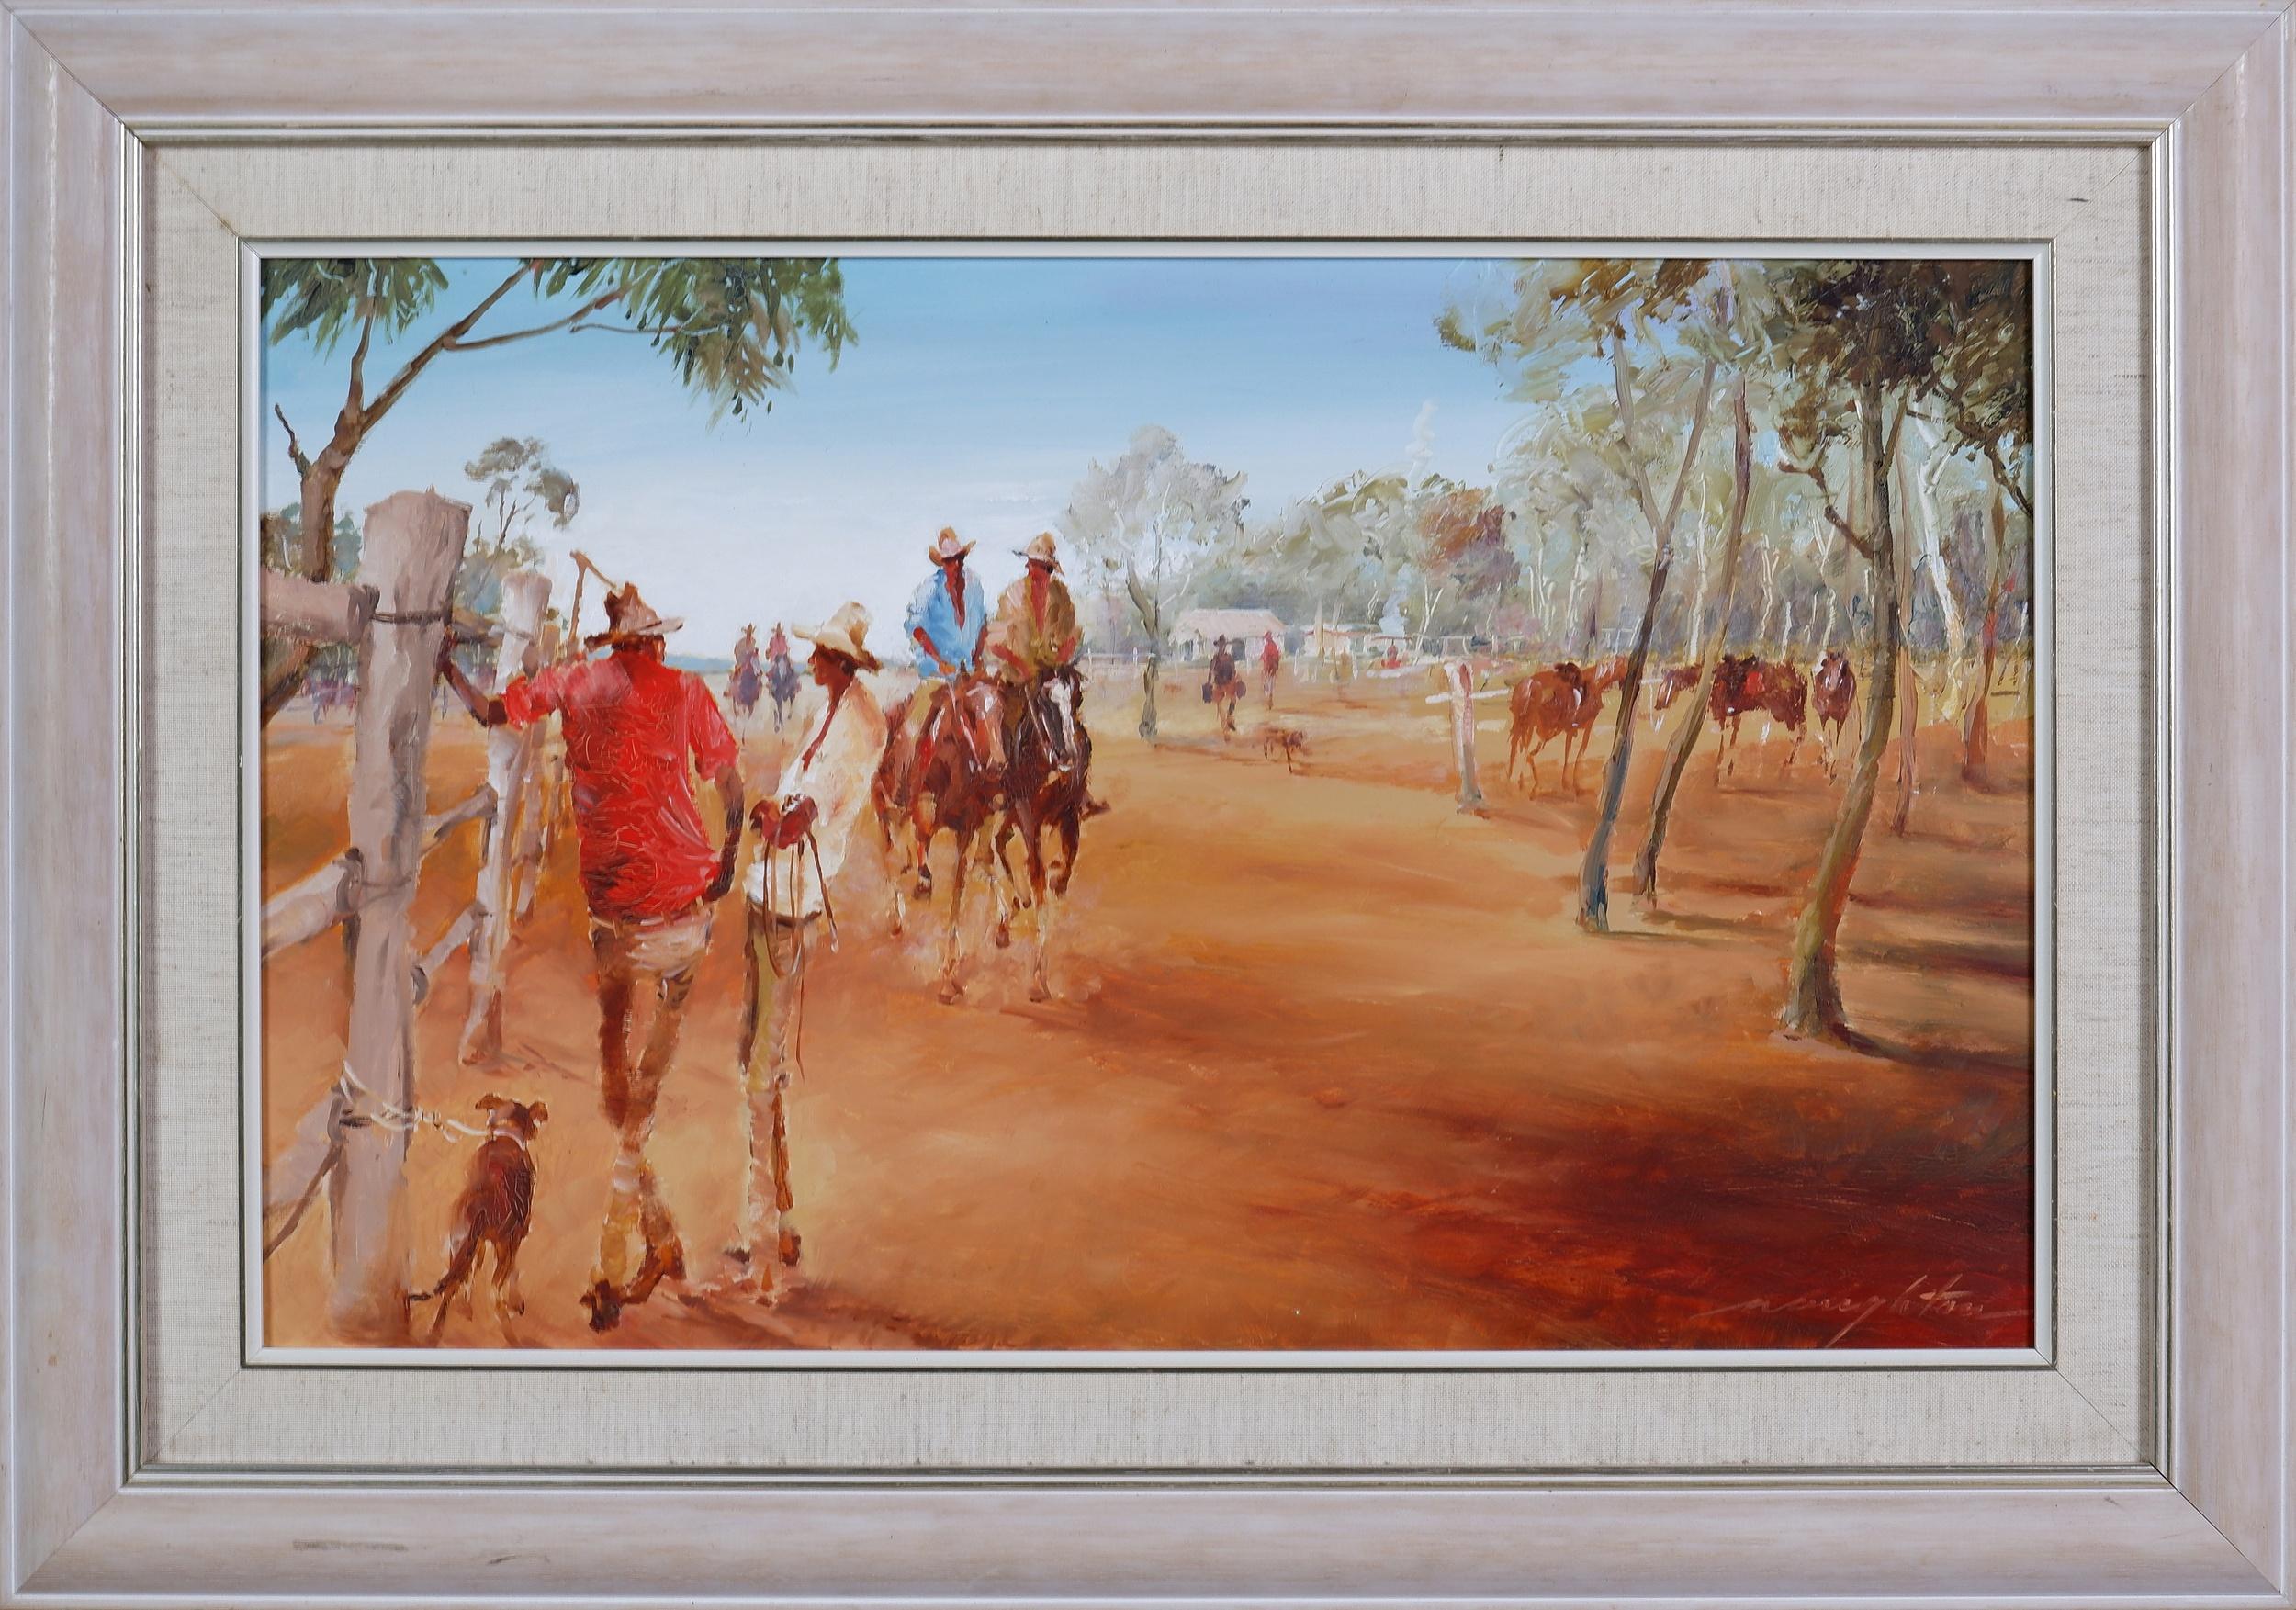 'Keith Naughton (1925-2019), Paltarra Camp, North Queensland, Oil on Board'